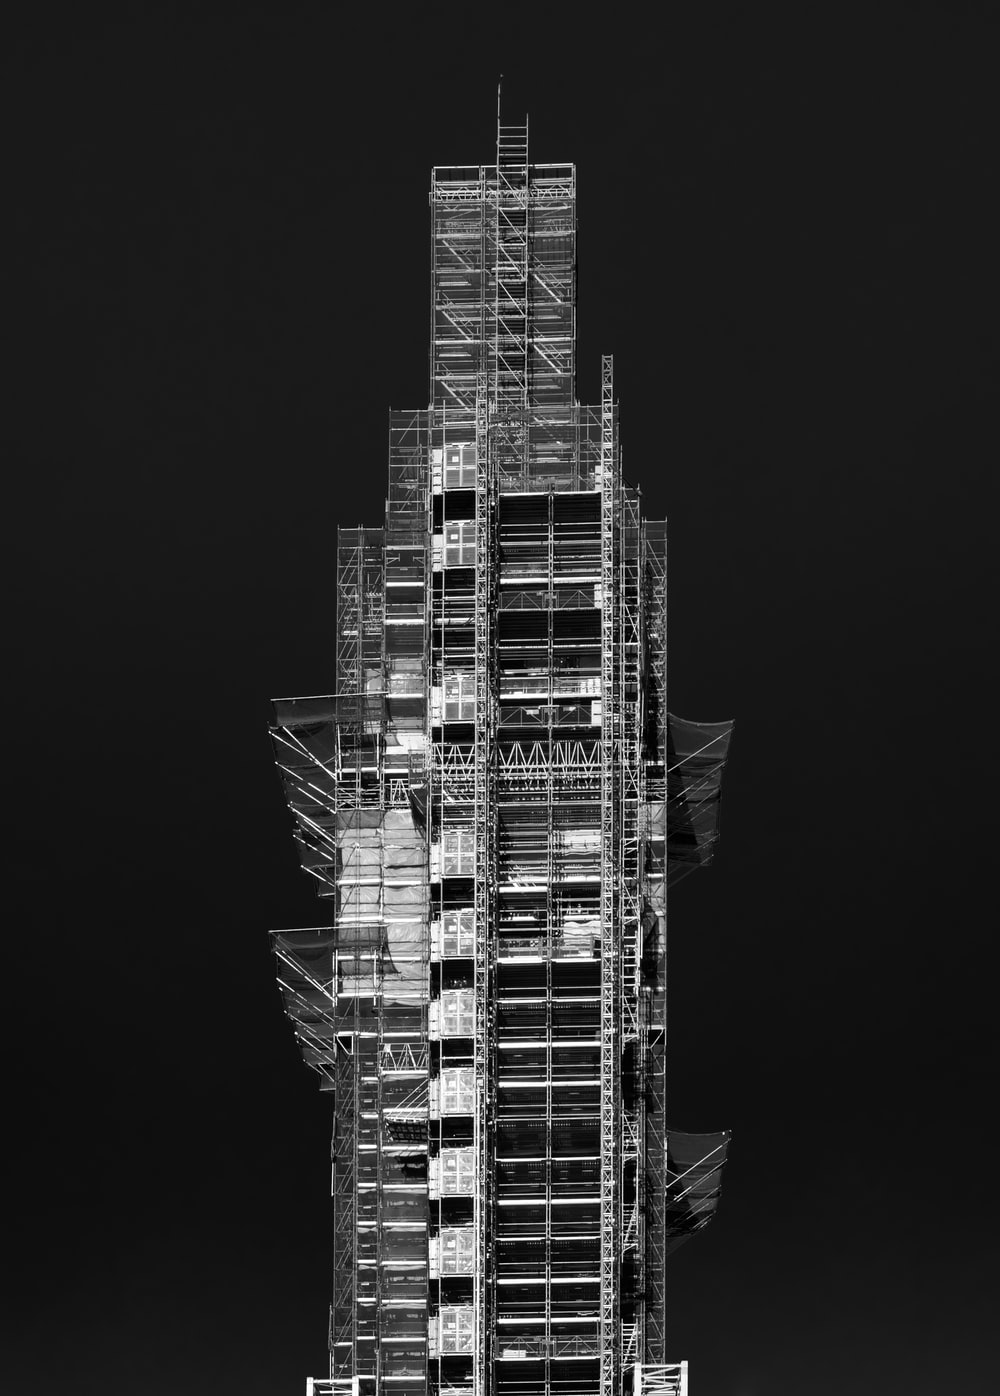 gray metal scaffolding